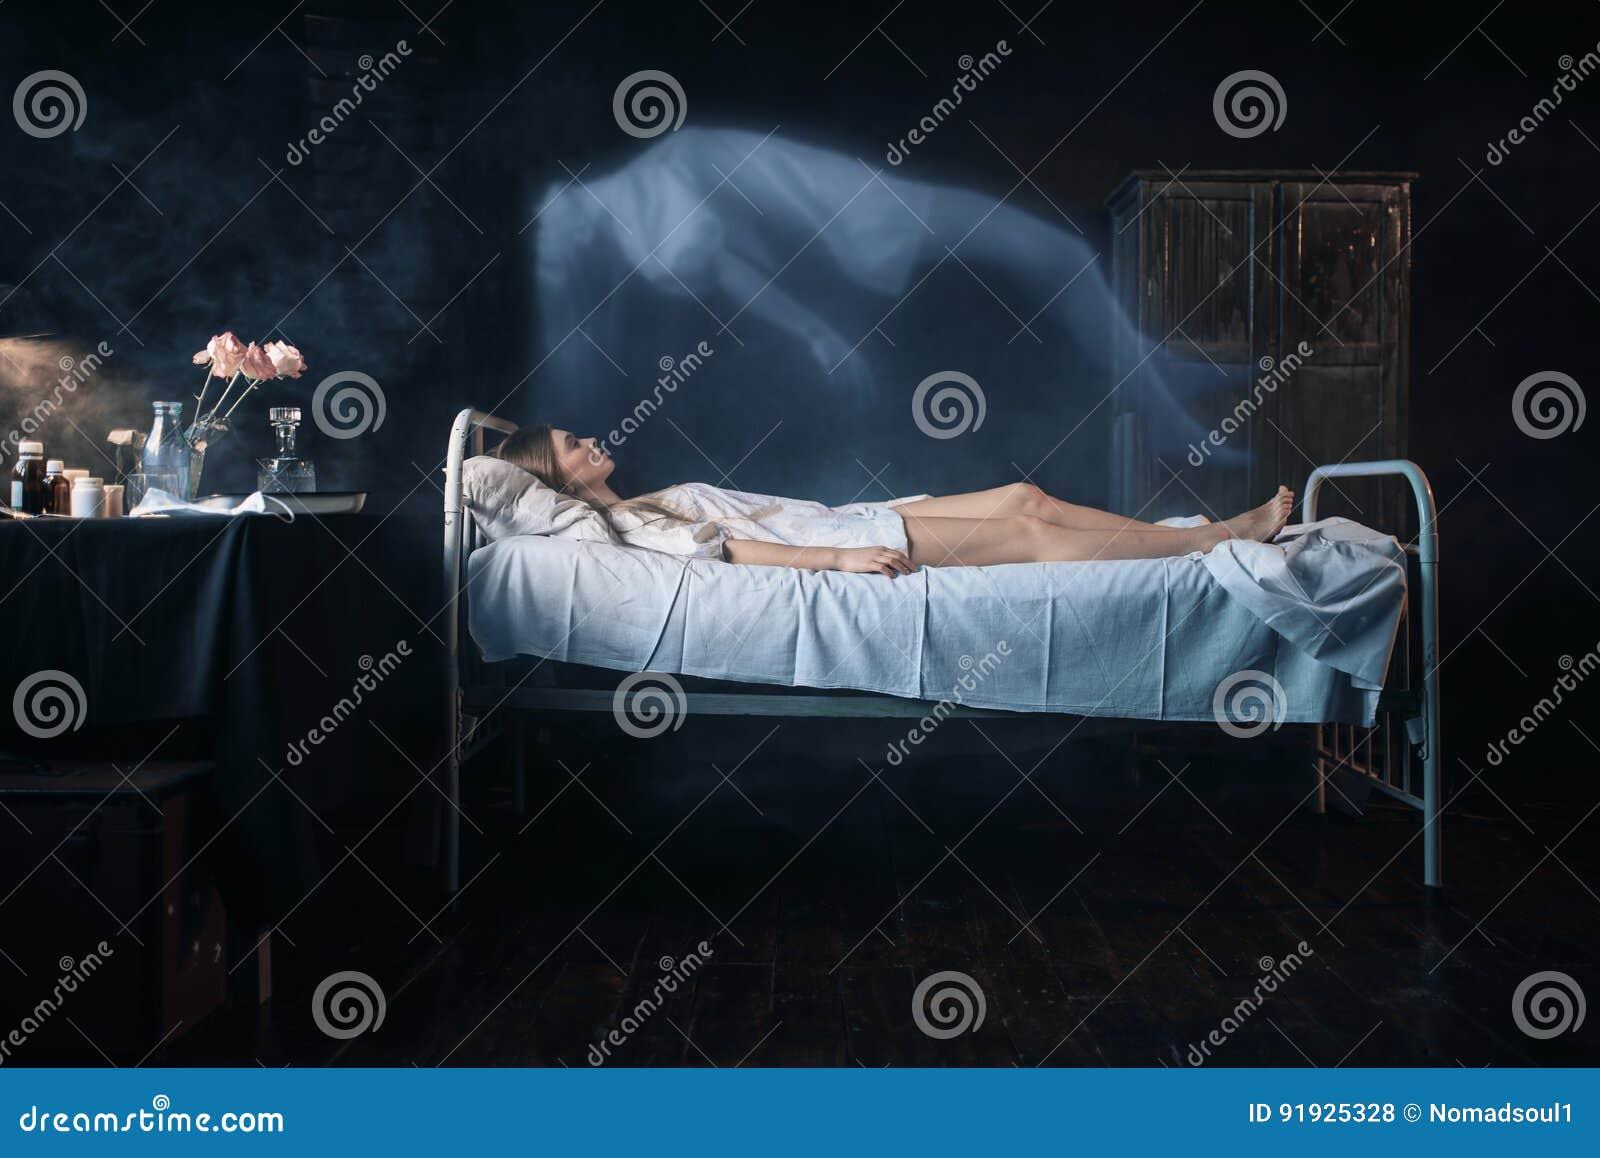 Ill woman lying in hospital bed, soul leaves body